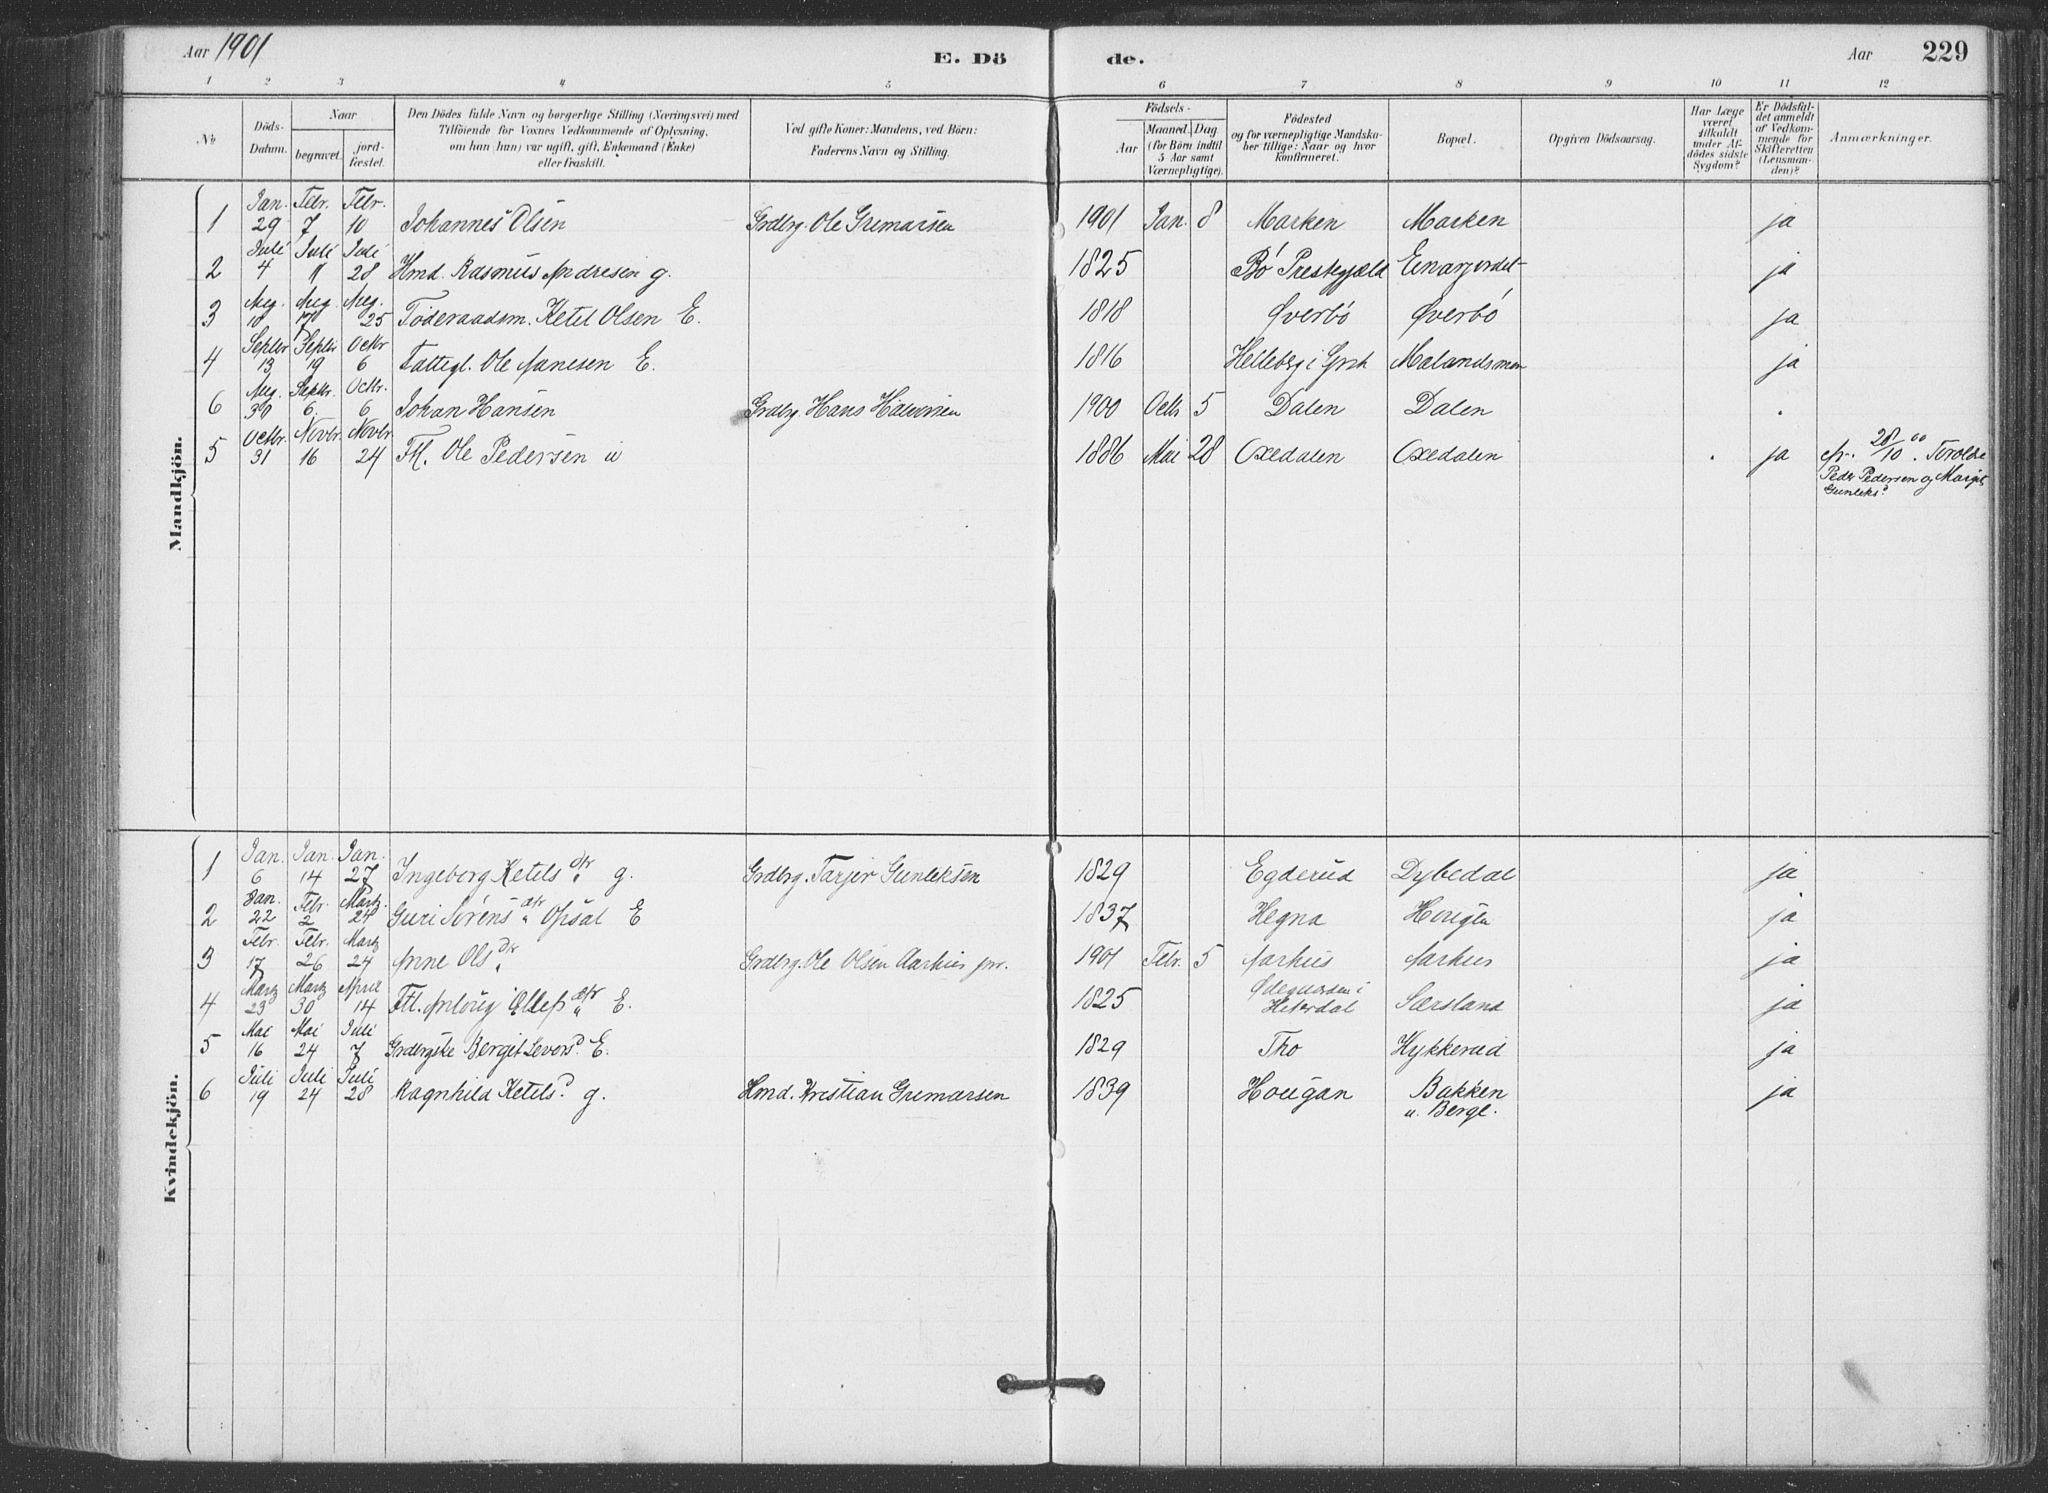 SAKO, Hjartdal kirkebøker, F/Fa/L0010: Ministerialbok nr. I 10, 1880-1929, s. 229